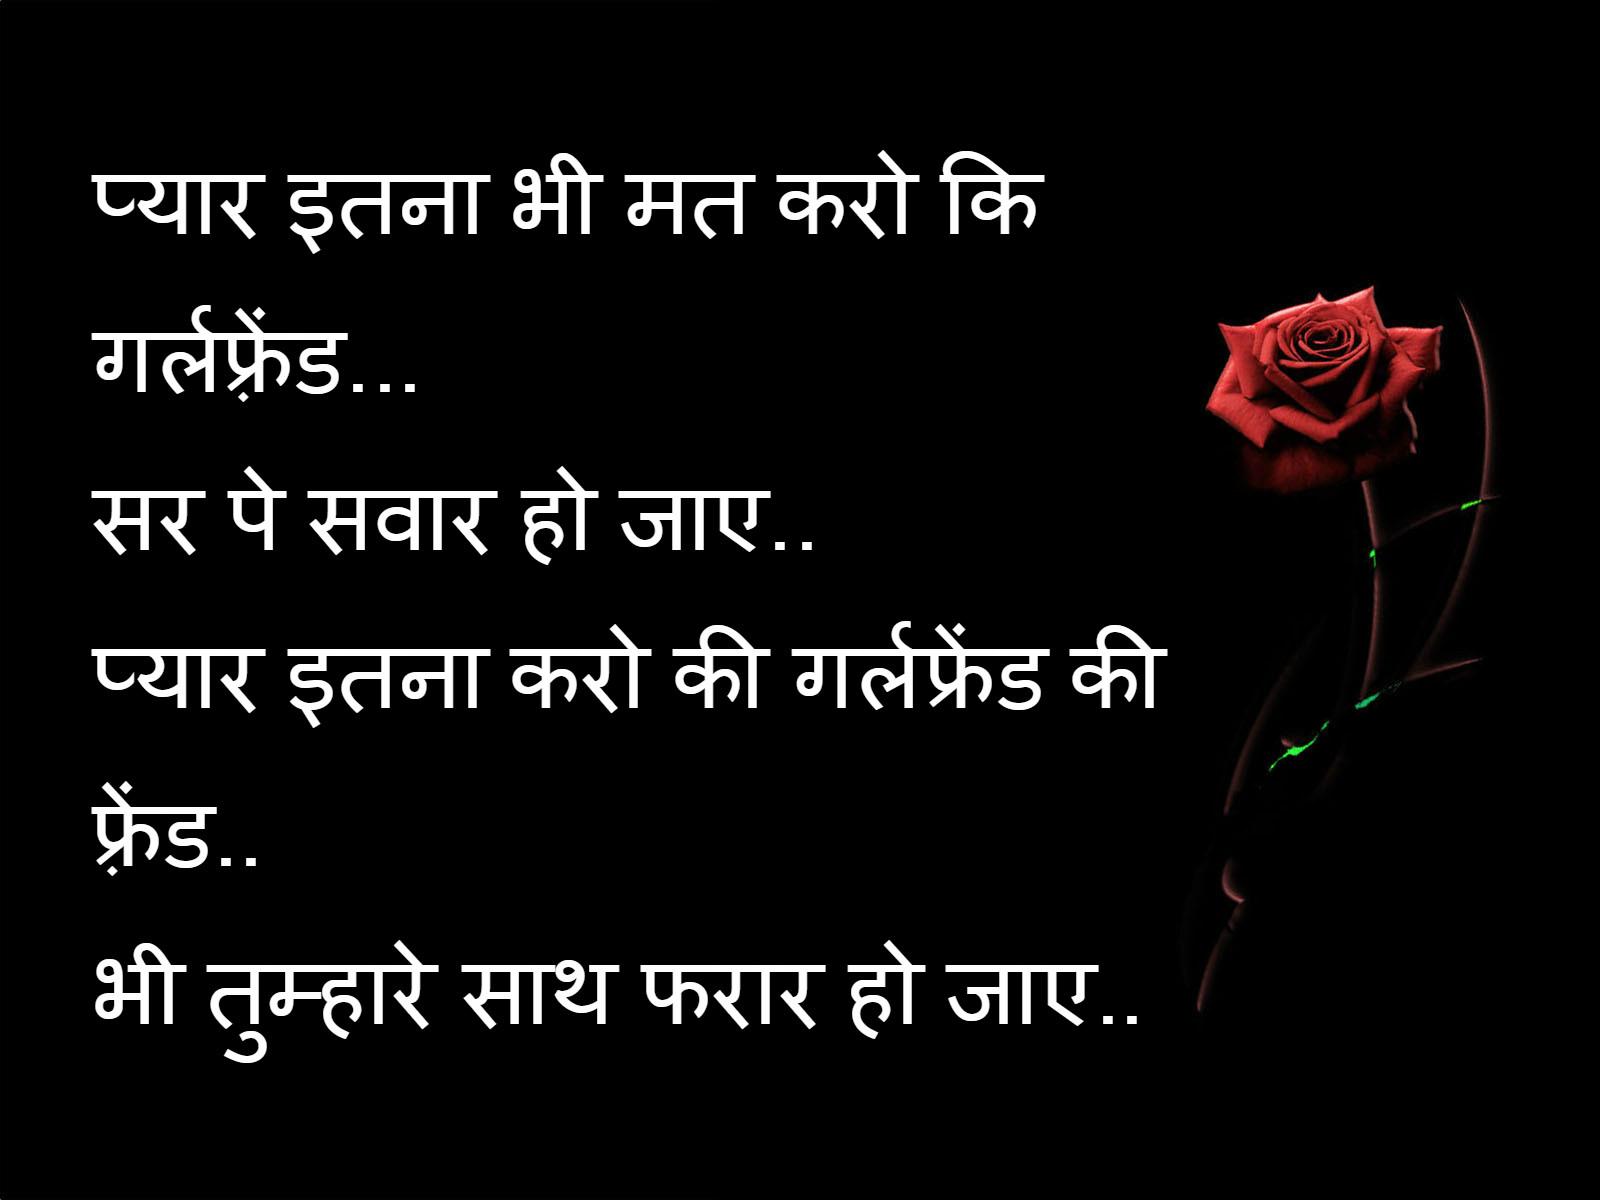 Good night status in hindi, gud ni8 quotes